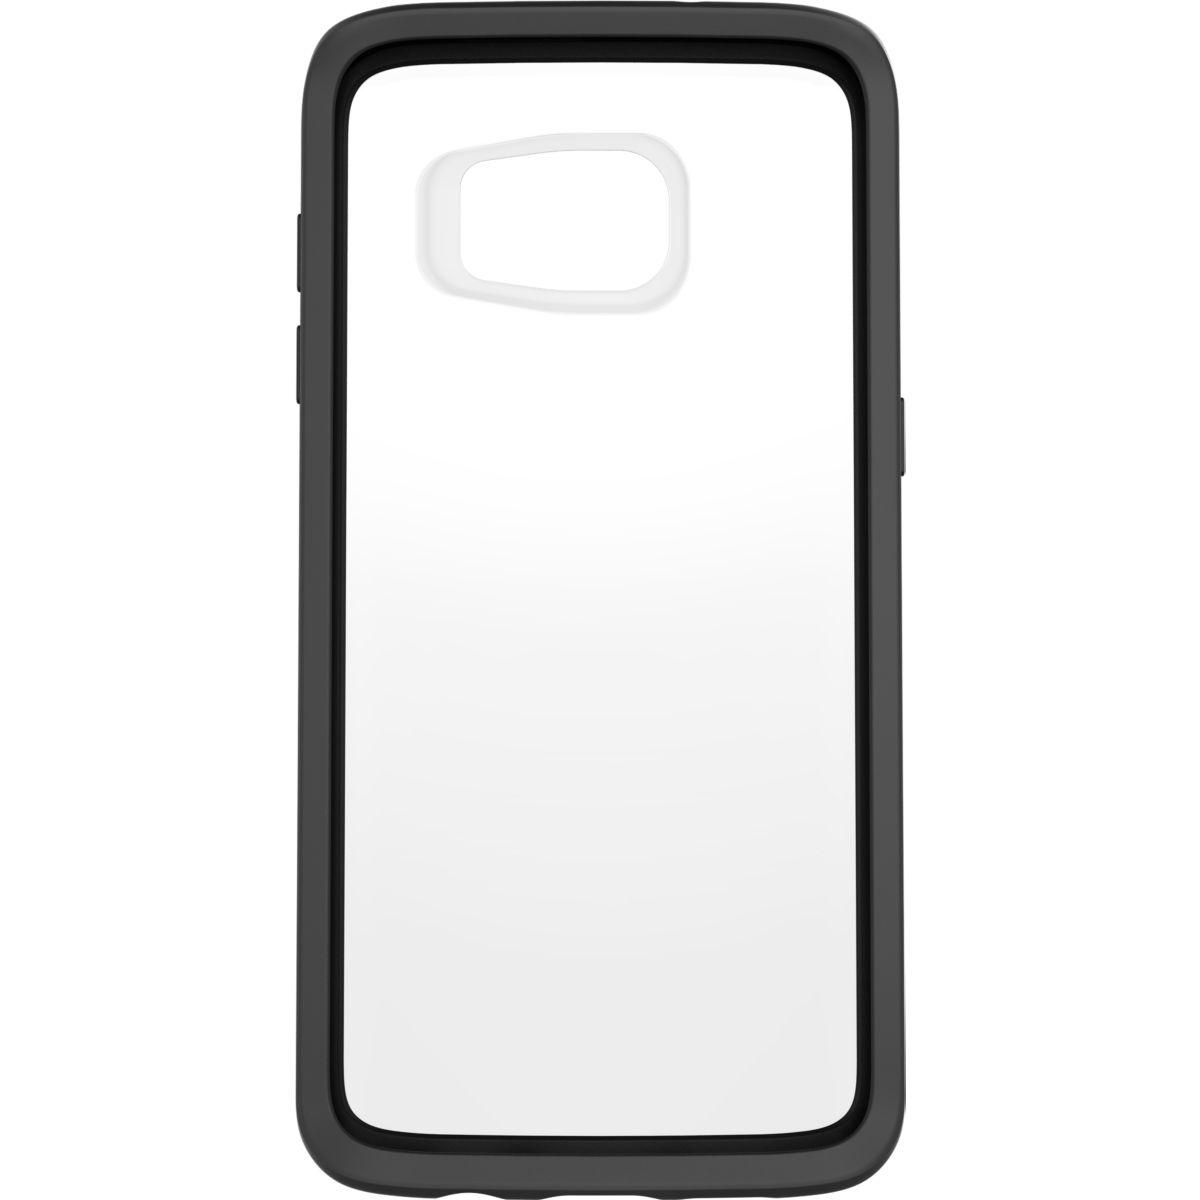 Coque OTTERBOX Galaxy S7 Edge Symmetry Clear noir